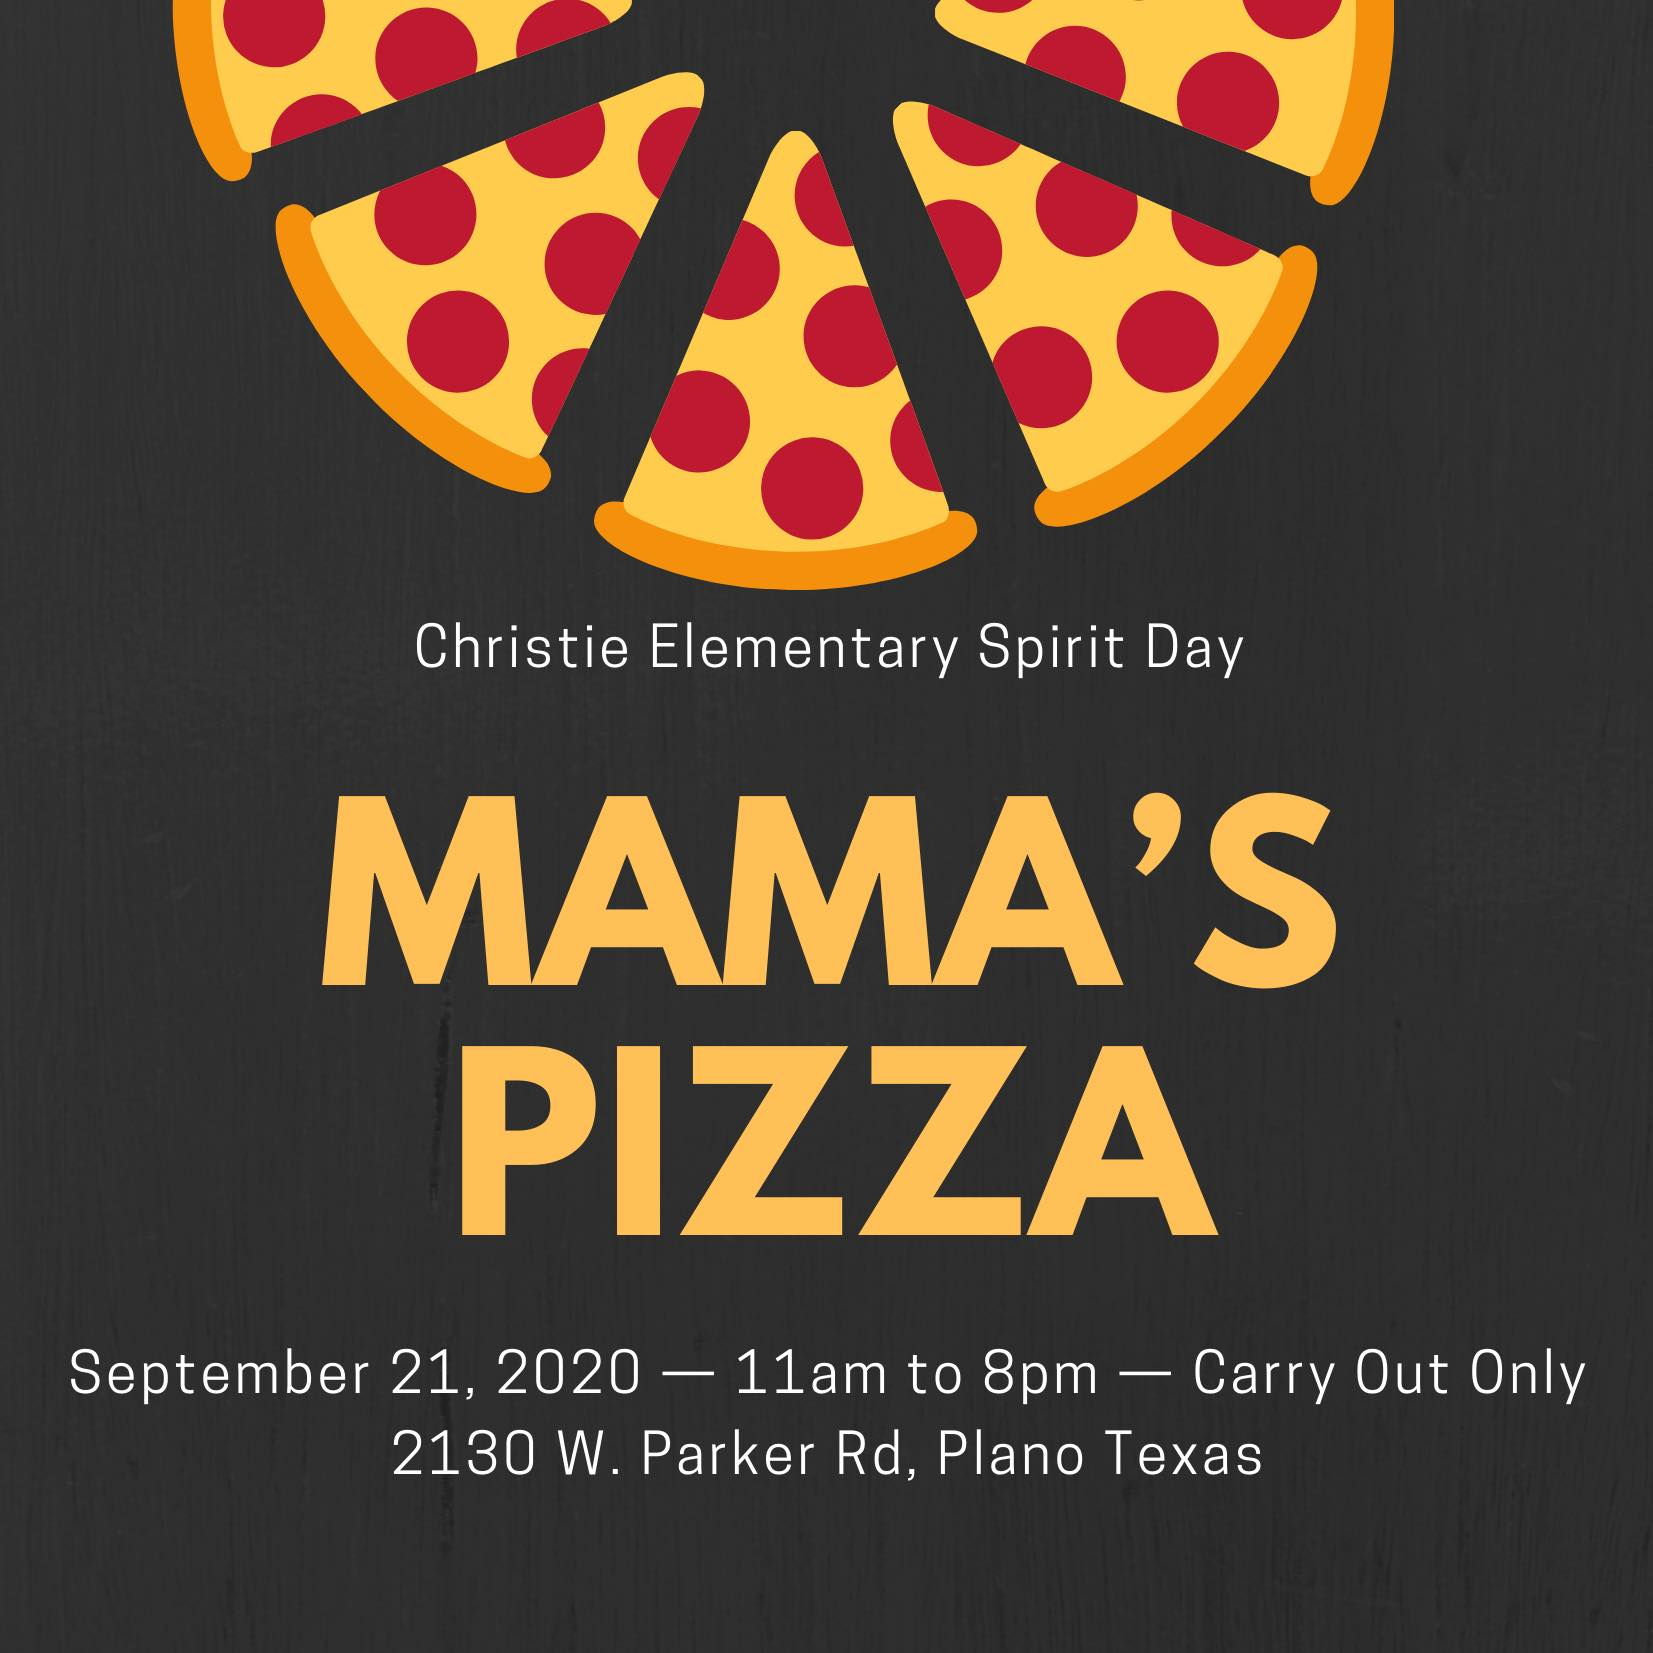 Mama's Pizza fundraiser info